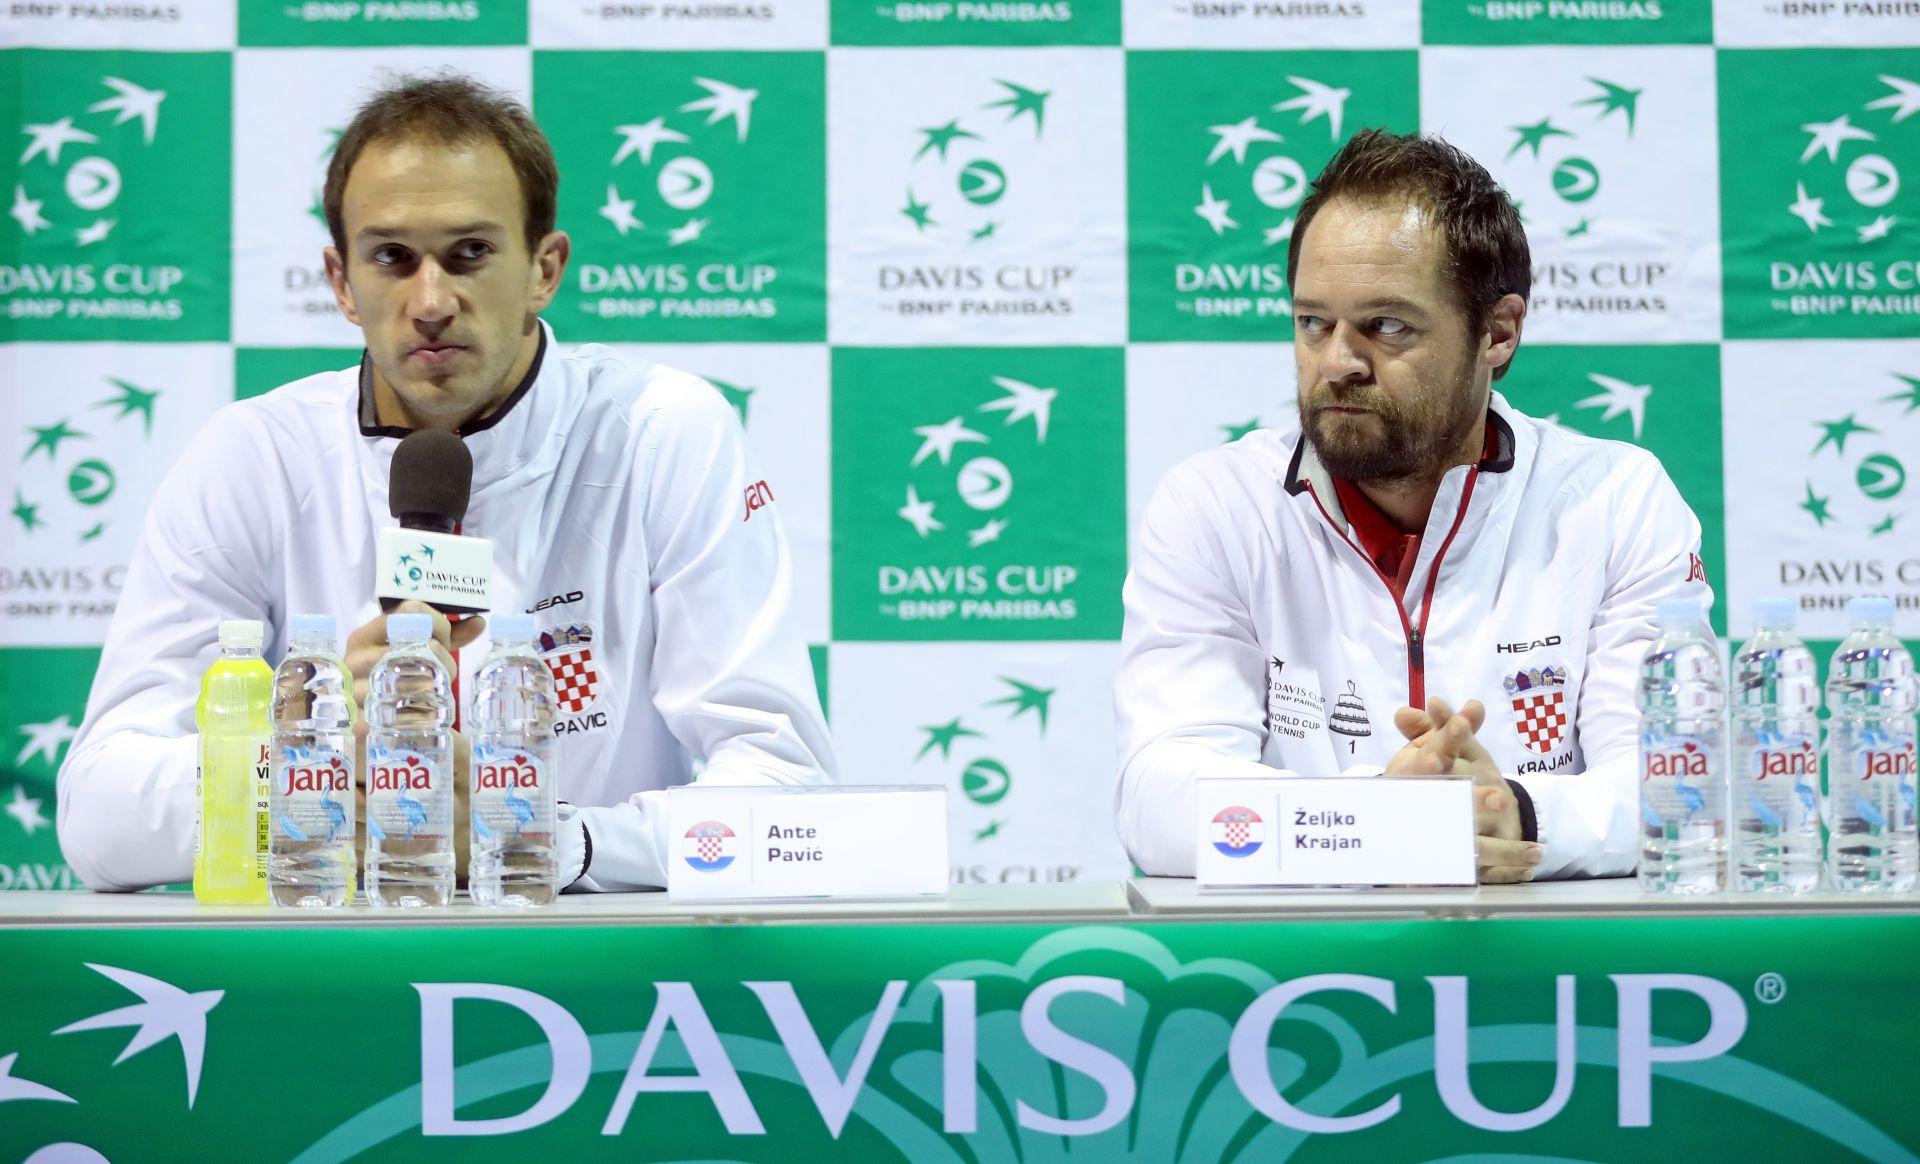 DAVIS CUP Australija, Francuska, Srbija i Italija korak do prolaza